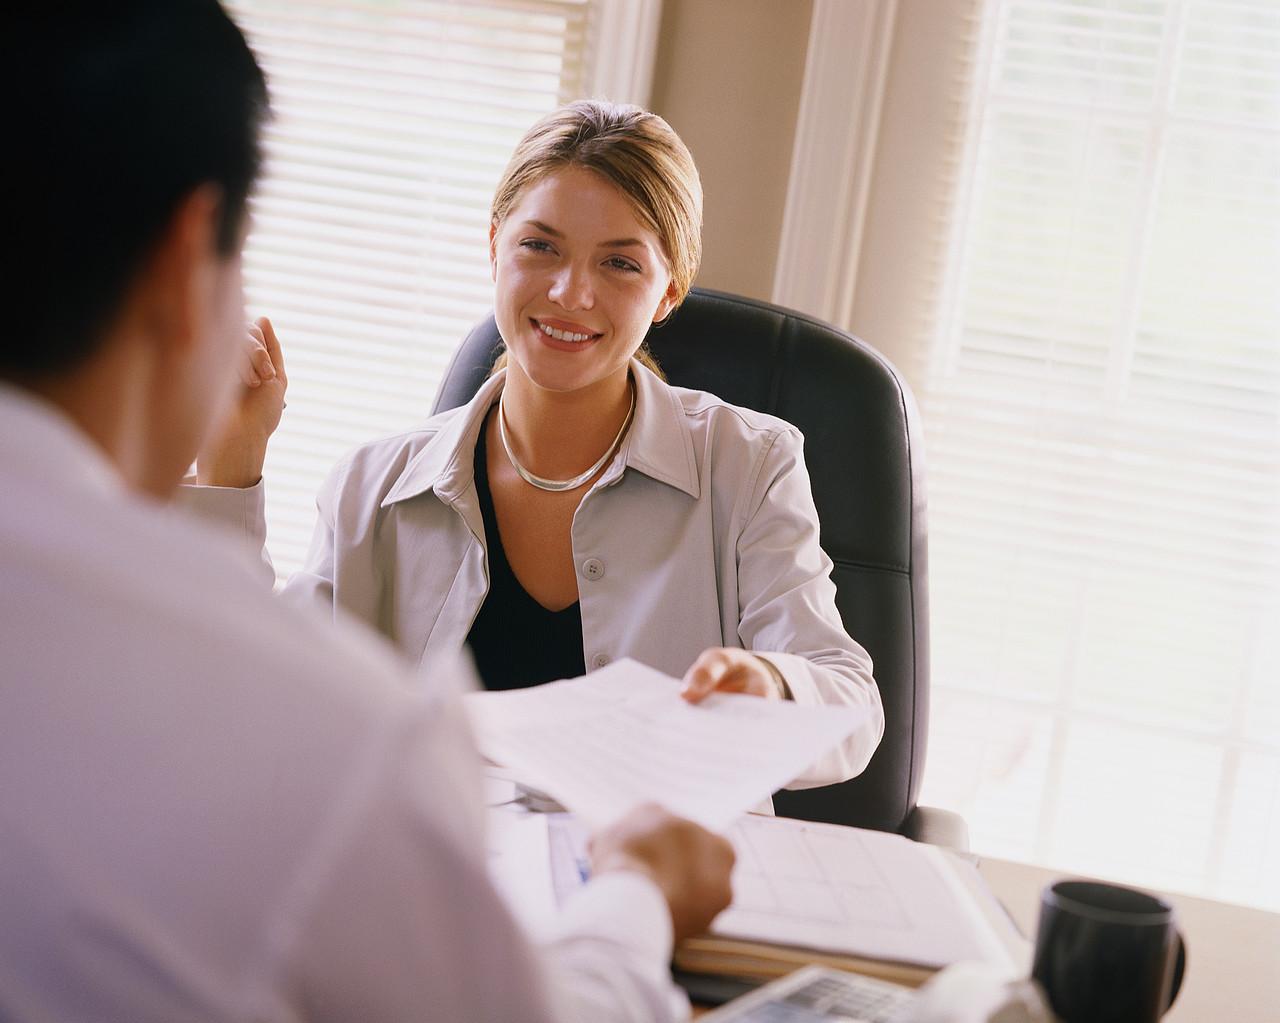 interview-tips-educators